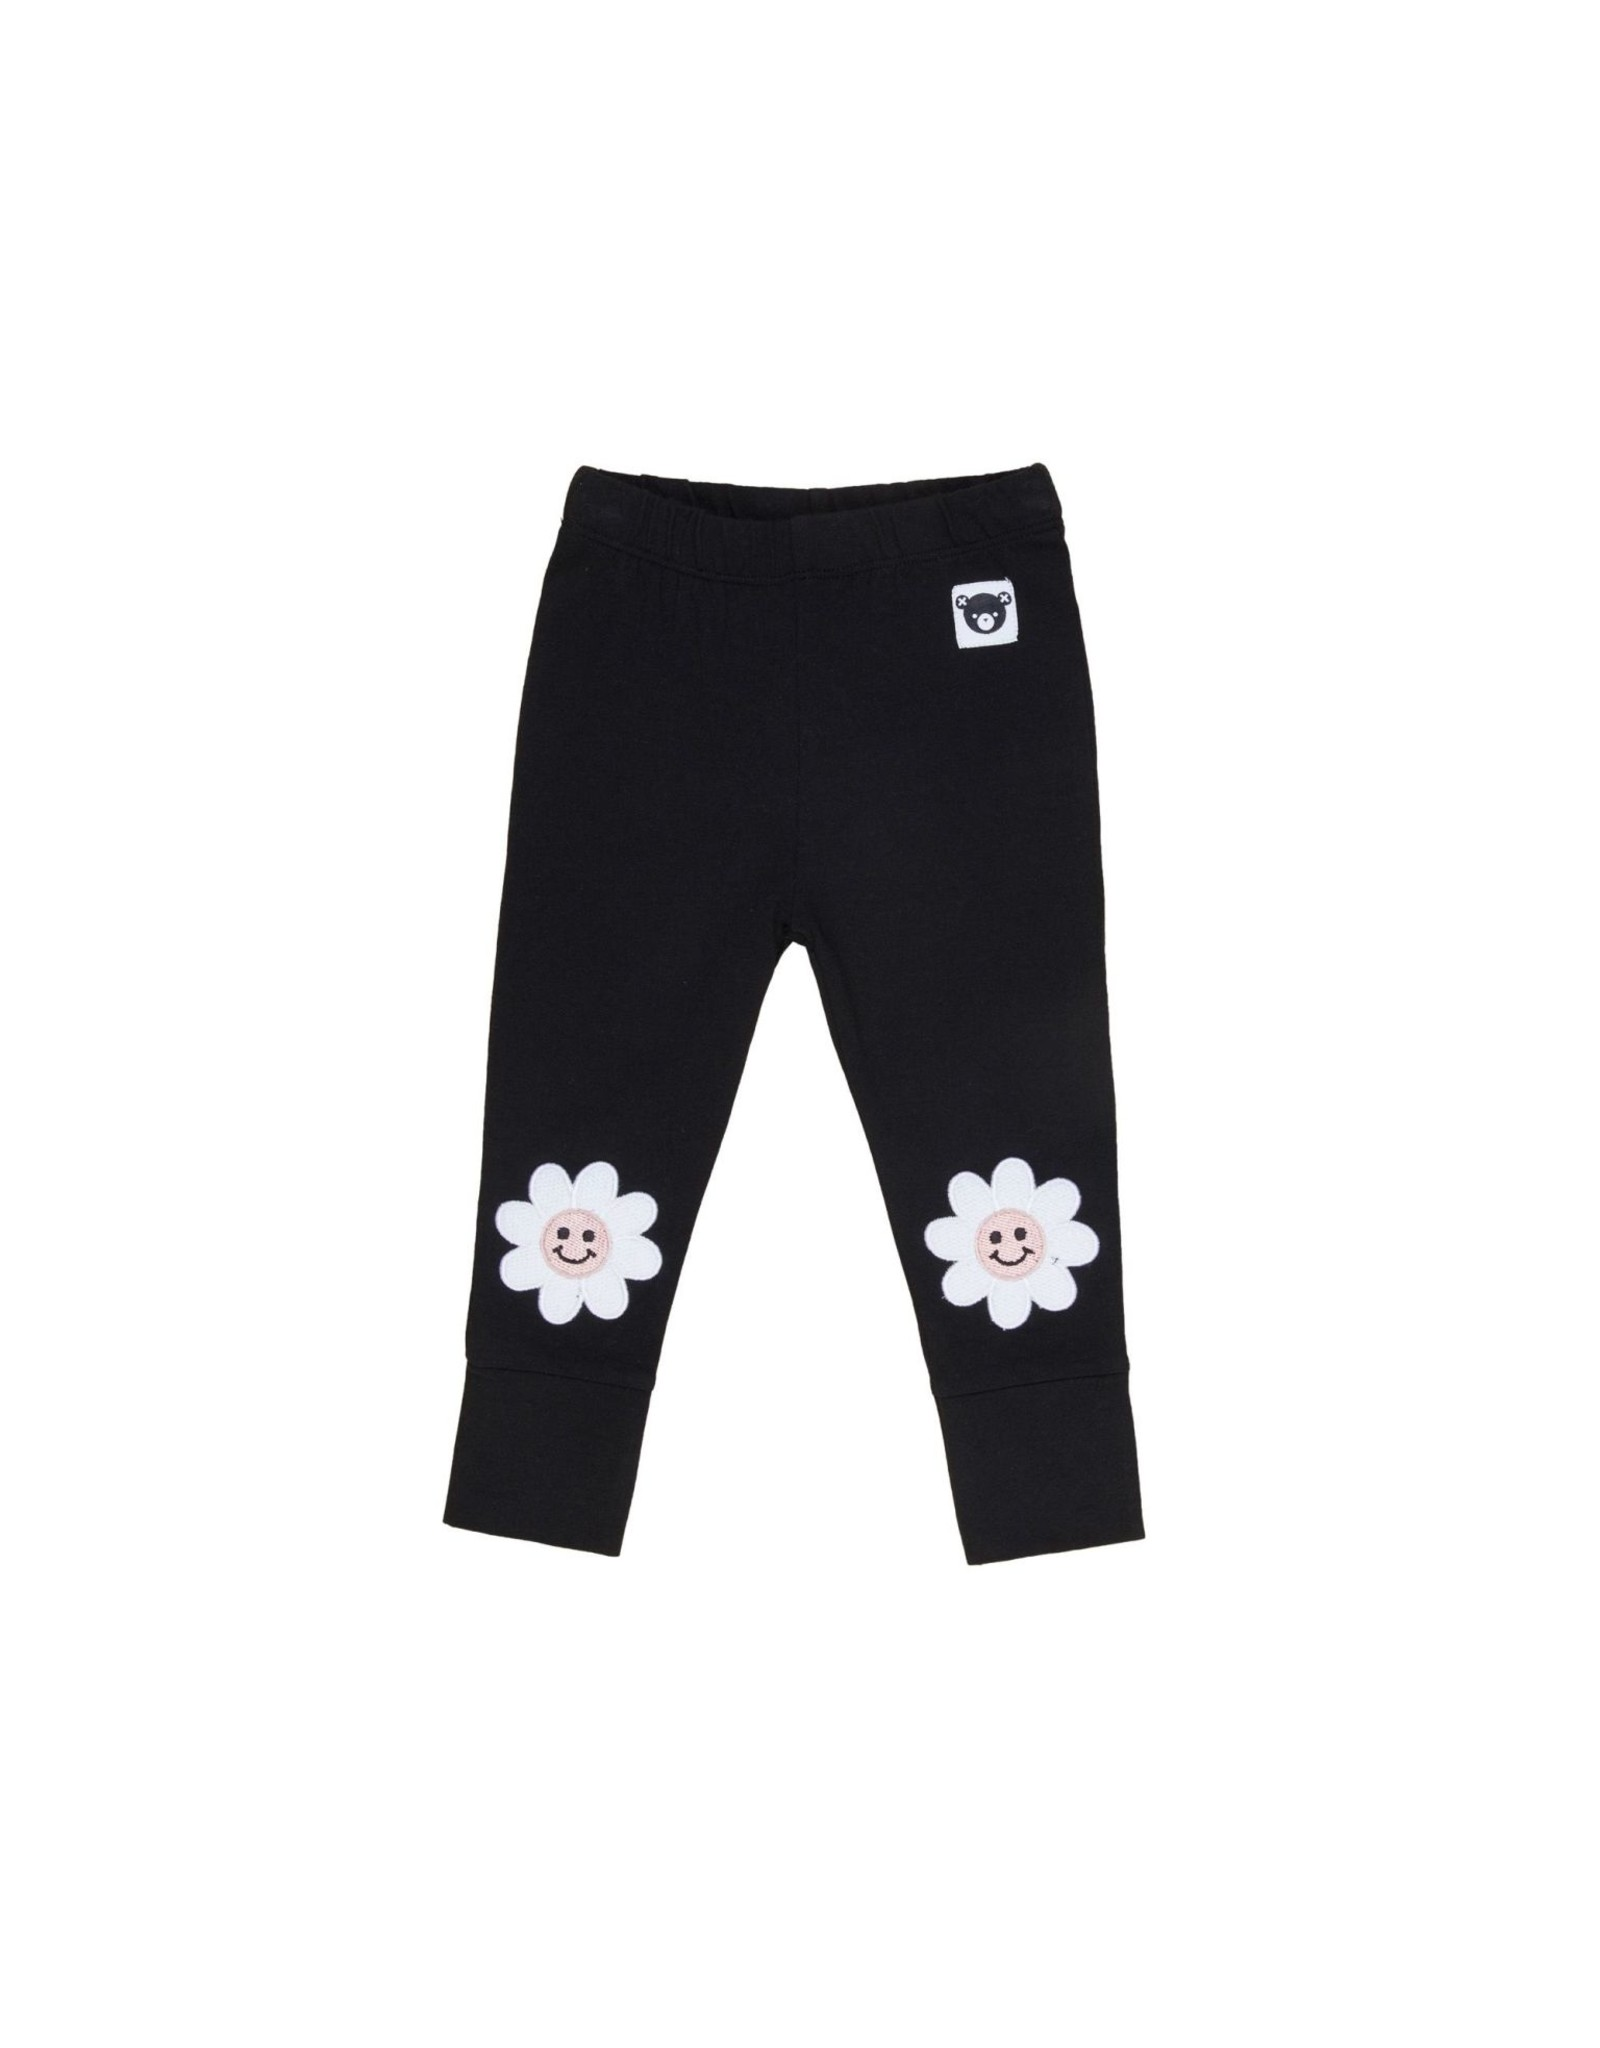 Huxbaby daisy legging